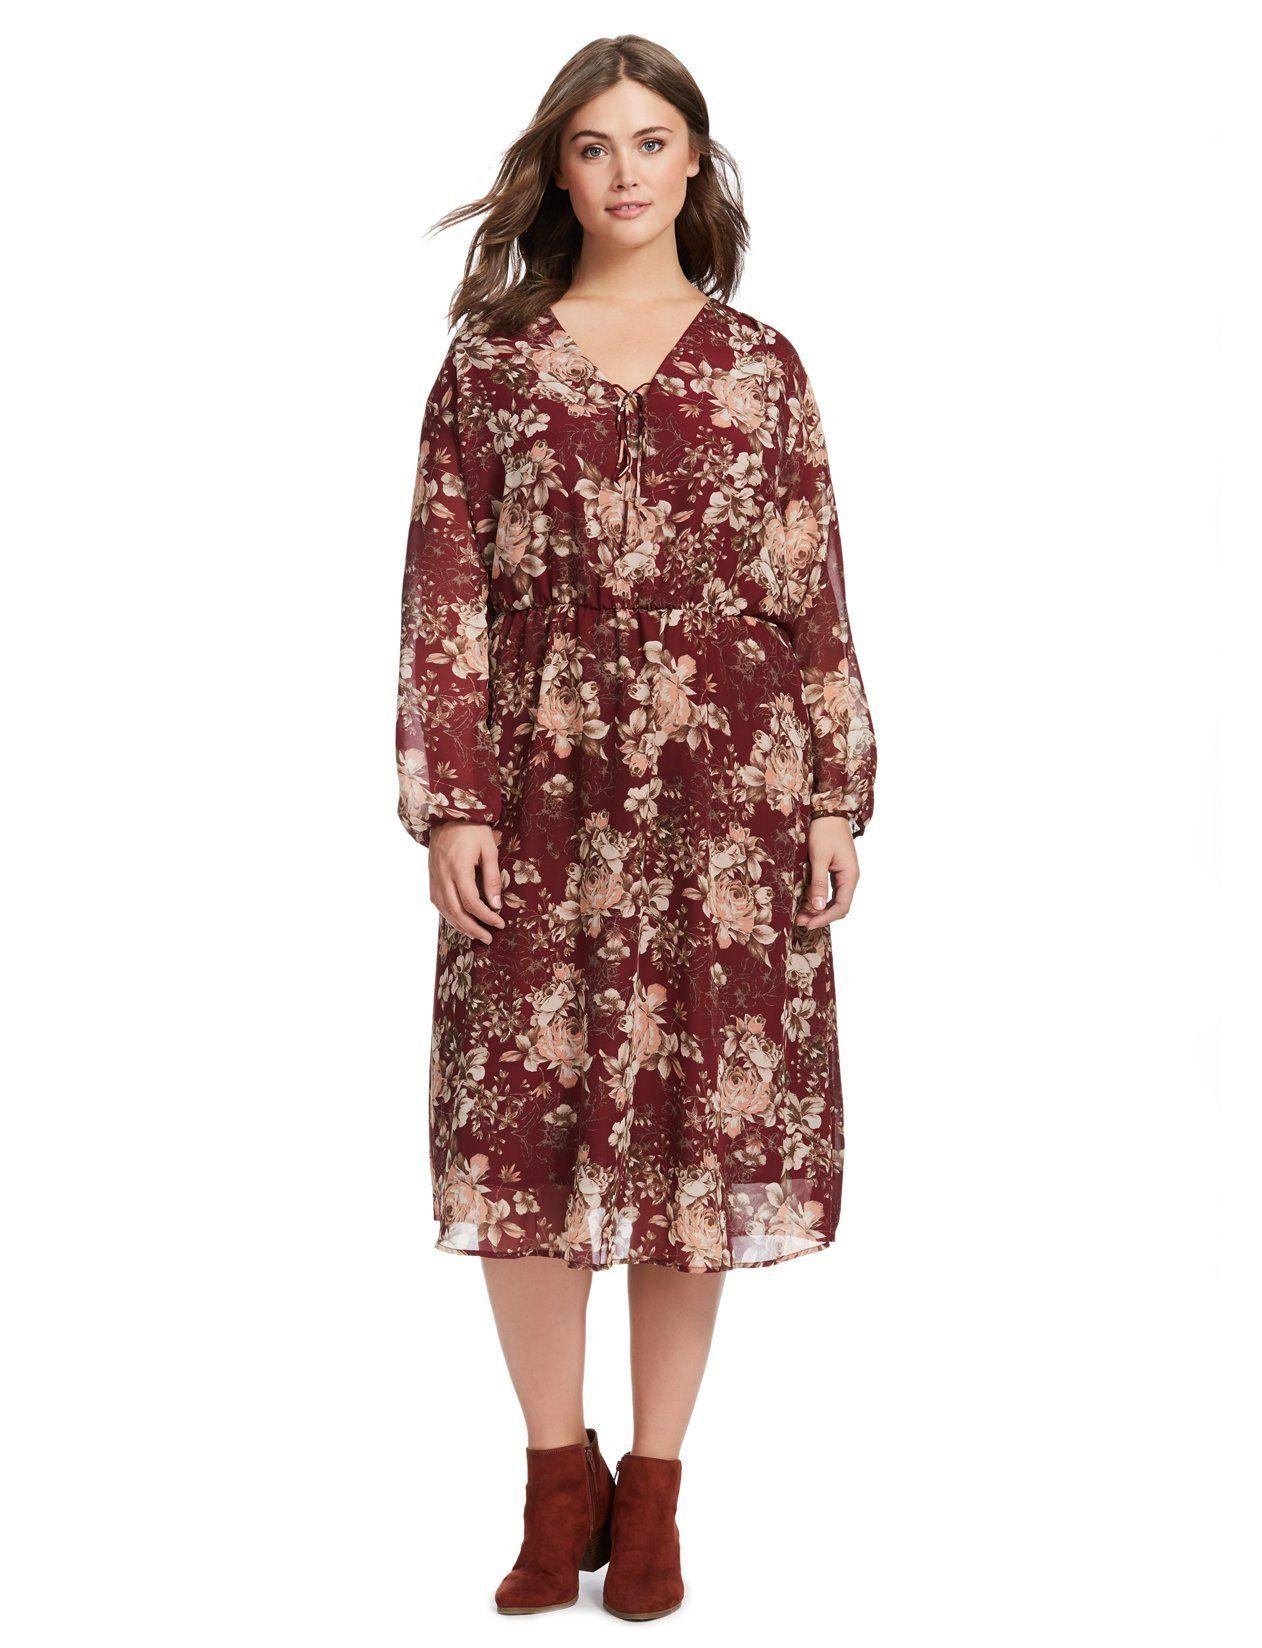 Long sleeve vneck dress in rosa wine print new arrivals closet